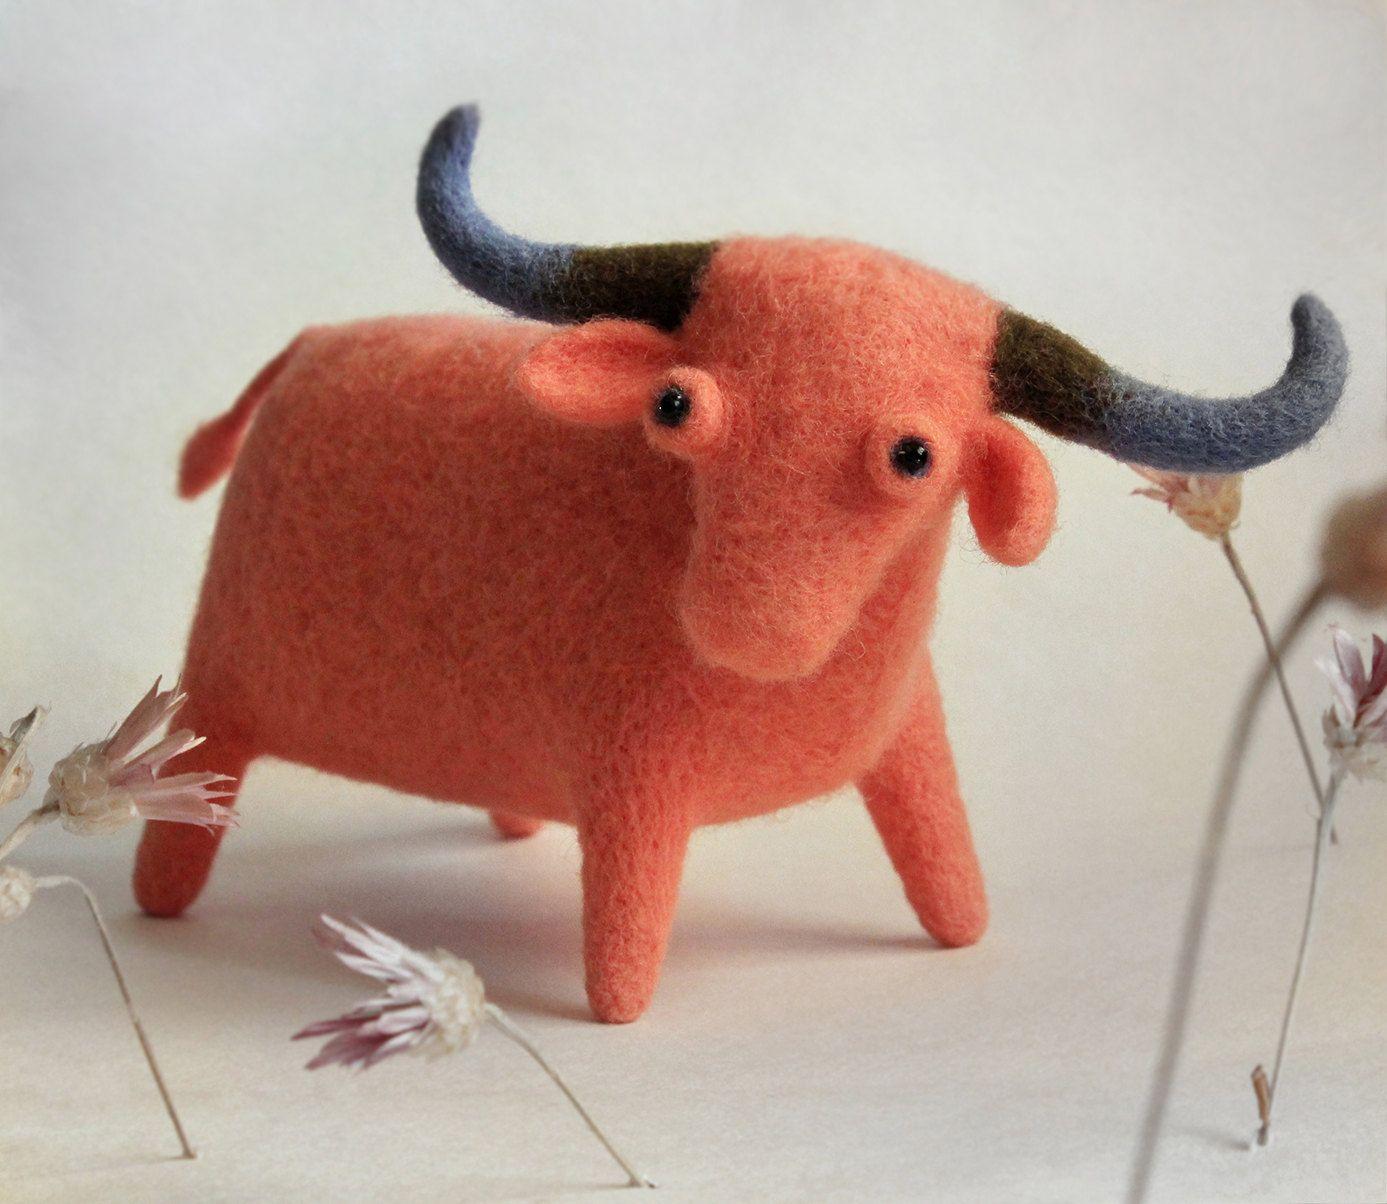 bull by Wooolsculpture on Etsy https://www.etsy.com/listing/220525174/bull